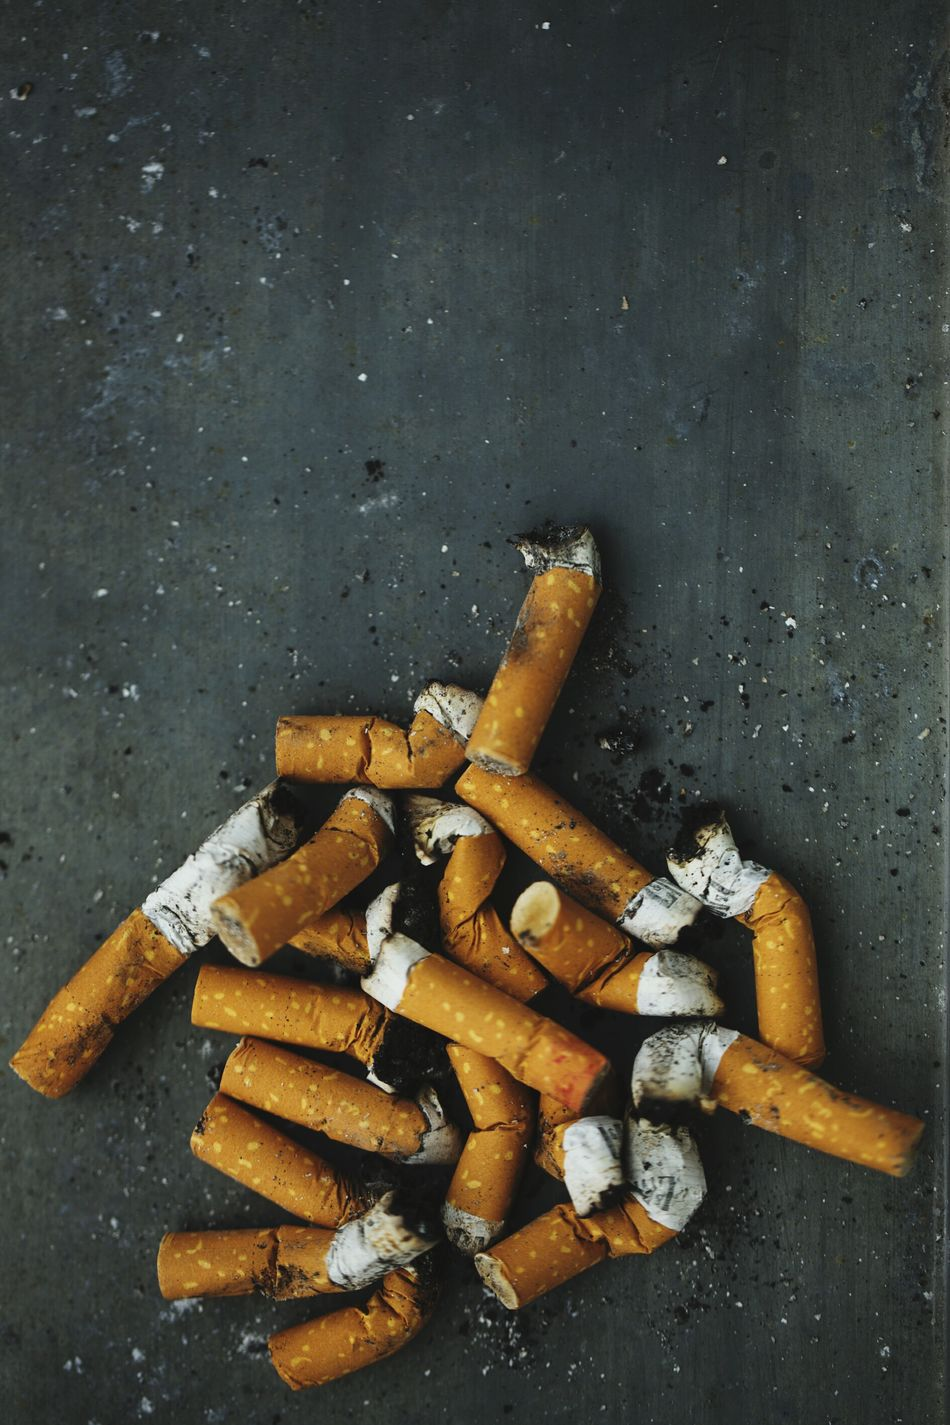 Healthcare And Medicine Cigarette Smoking Cigarette  Cigarette Stubs Zigaretten Cigaretts Close-up No People Cigarette